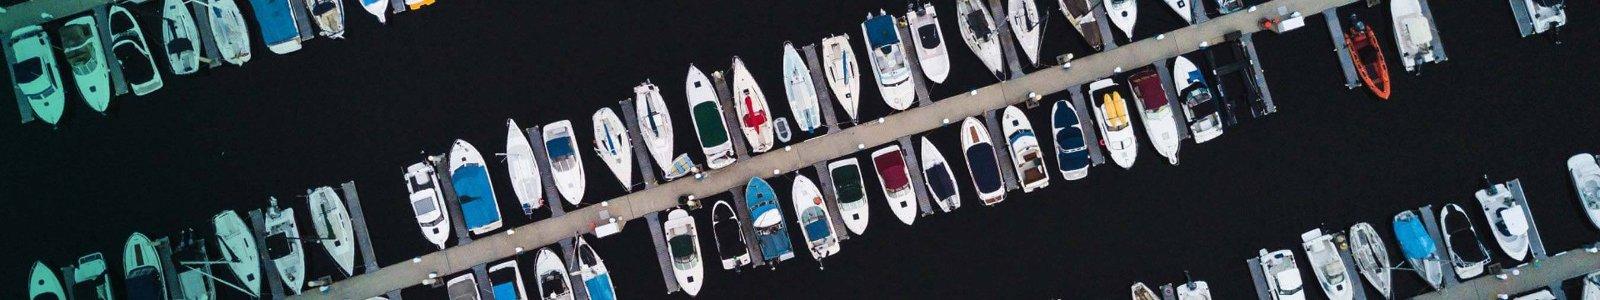 wharf locations